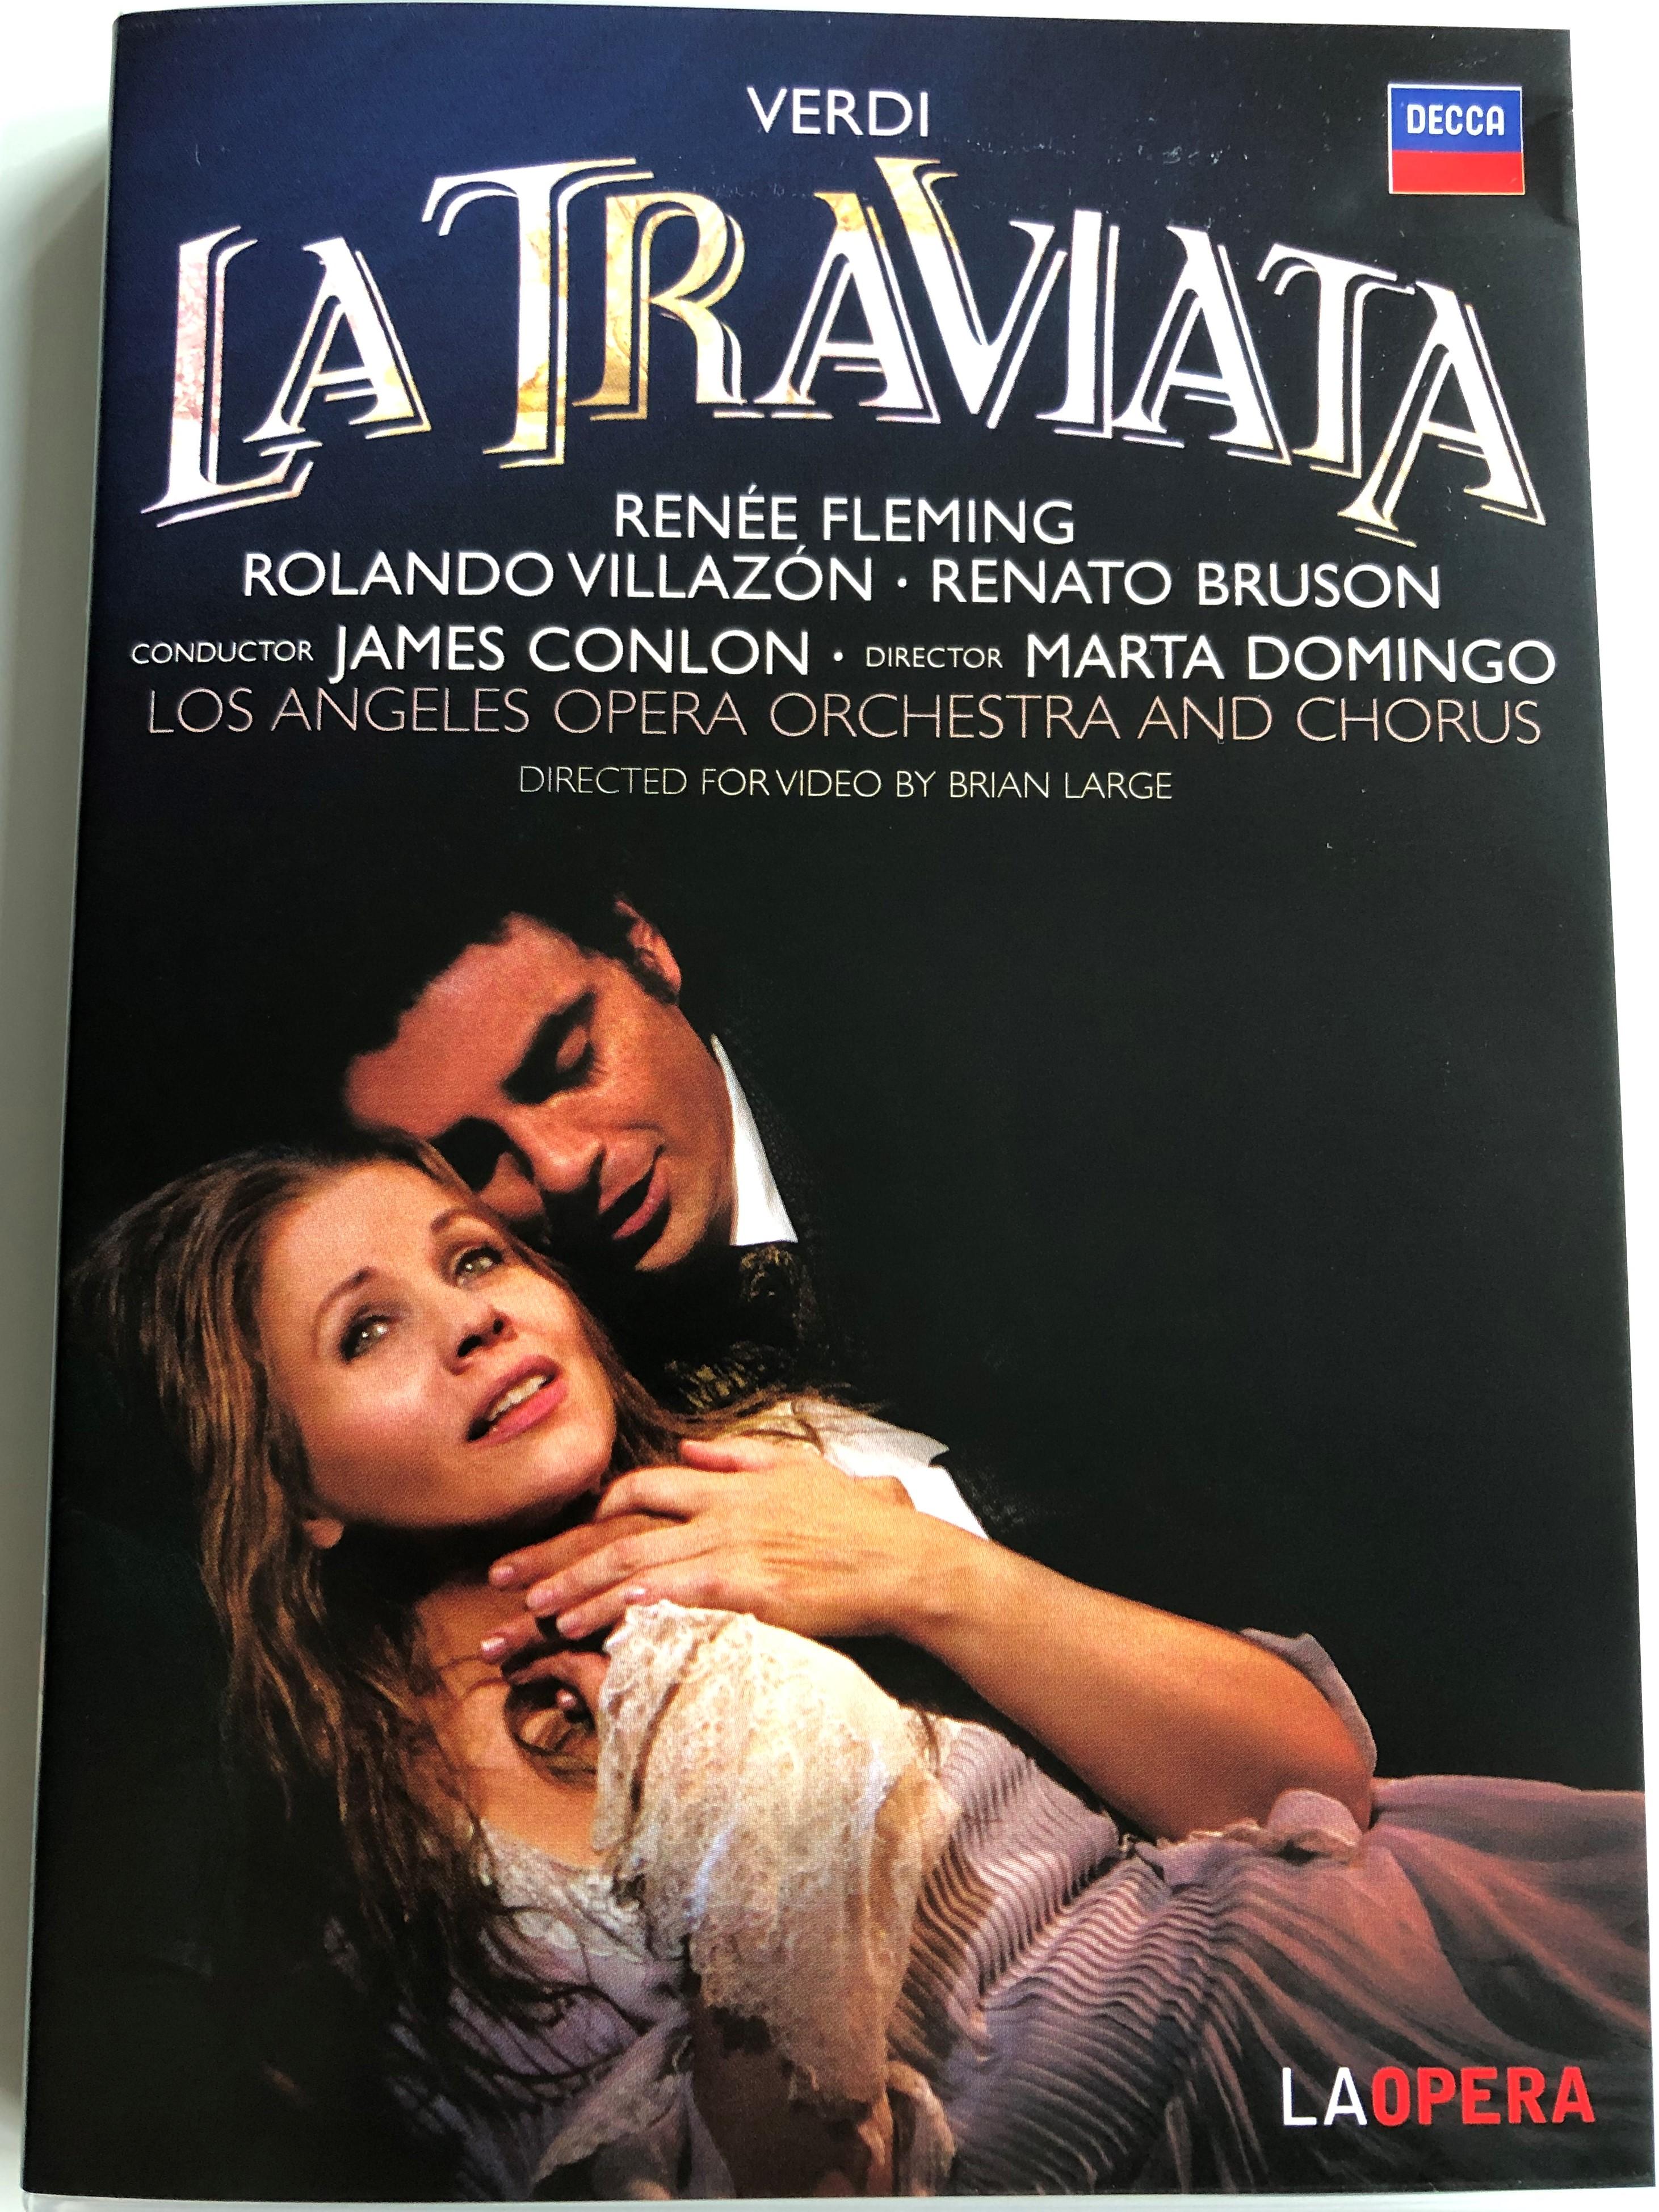 giuseppe-verdi-la-traviata-dvd-2006-directed-by-brian-large-pl-cido-domingo-1.jpg